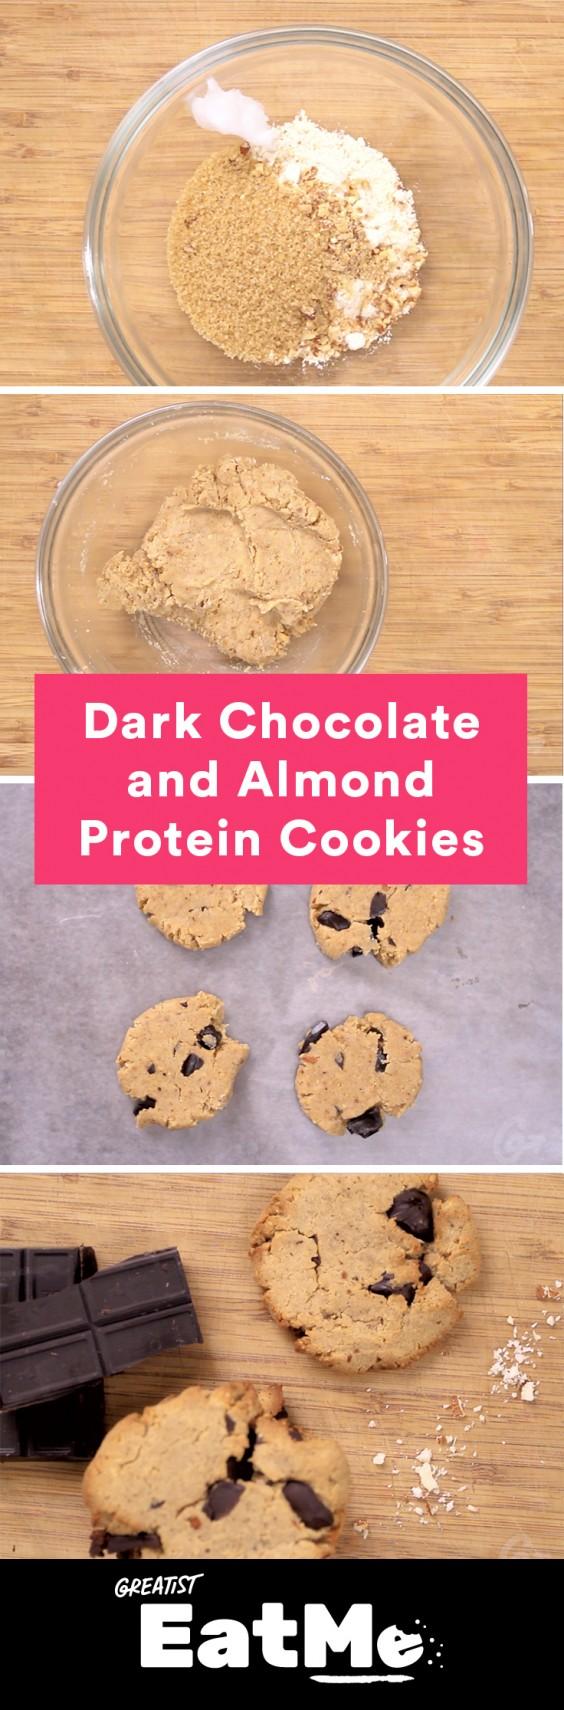 Eat Me Video: Dark Chocolate and Almond Cookies